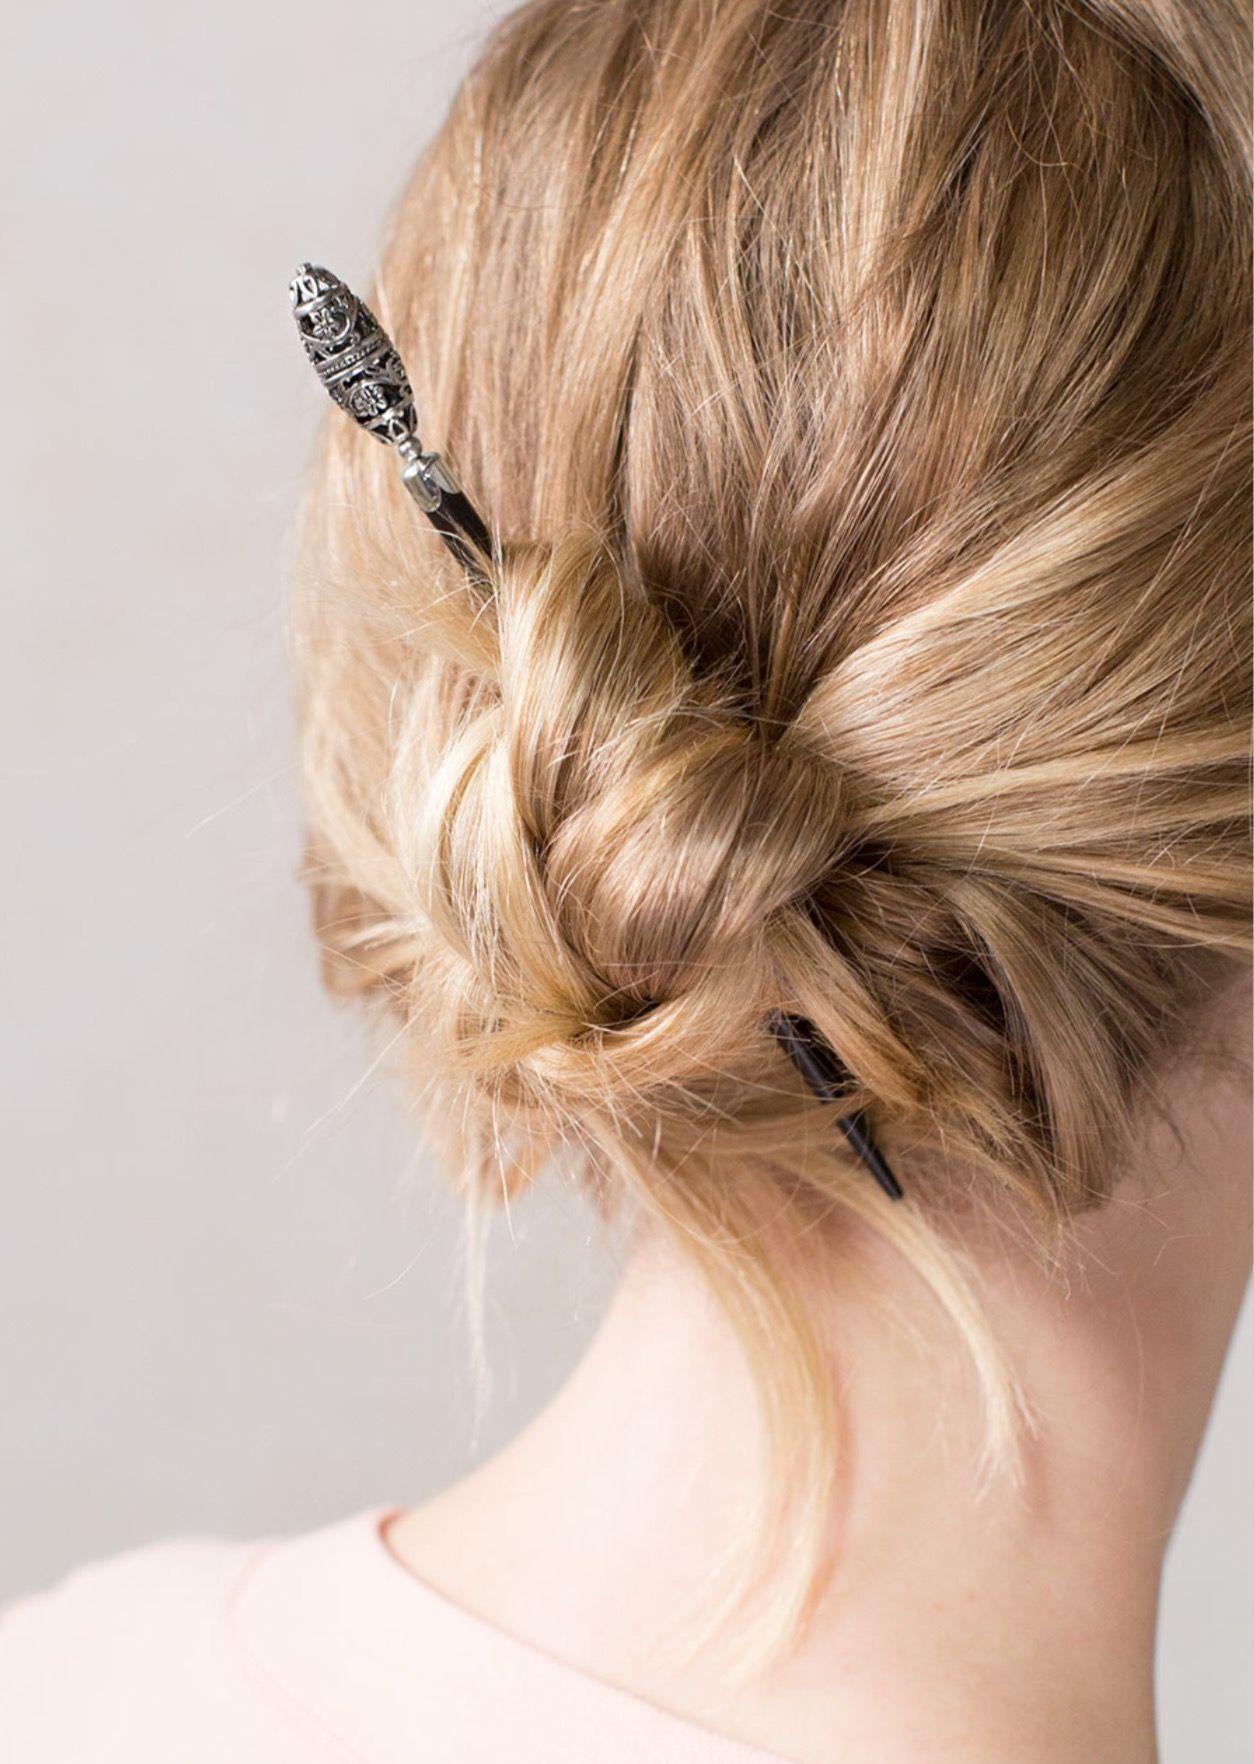 Simple knot www.lillarose.biz/abbielee #hair #hairstick   Rose hair, Hair hacks, Easy hairstyles